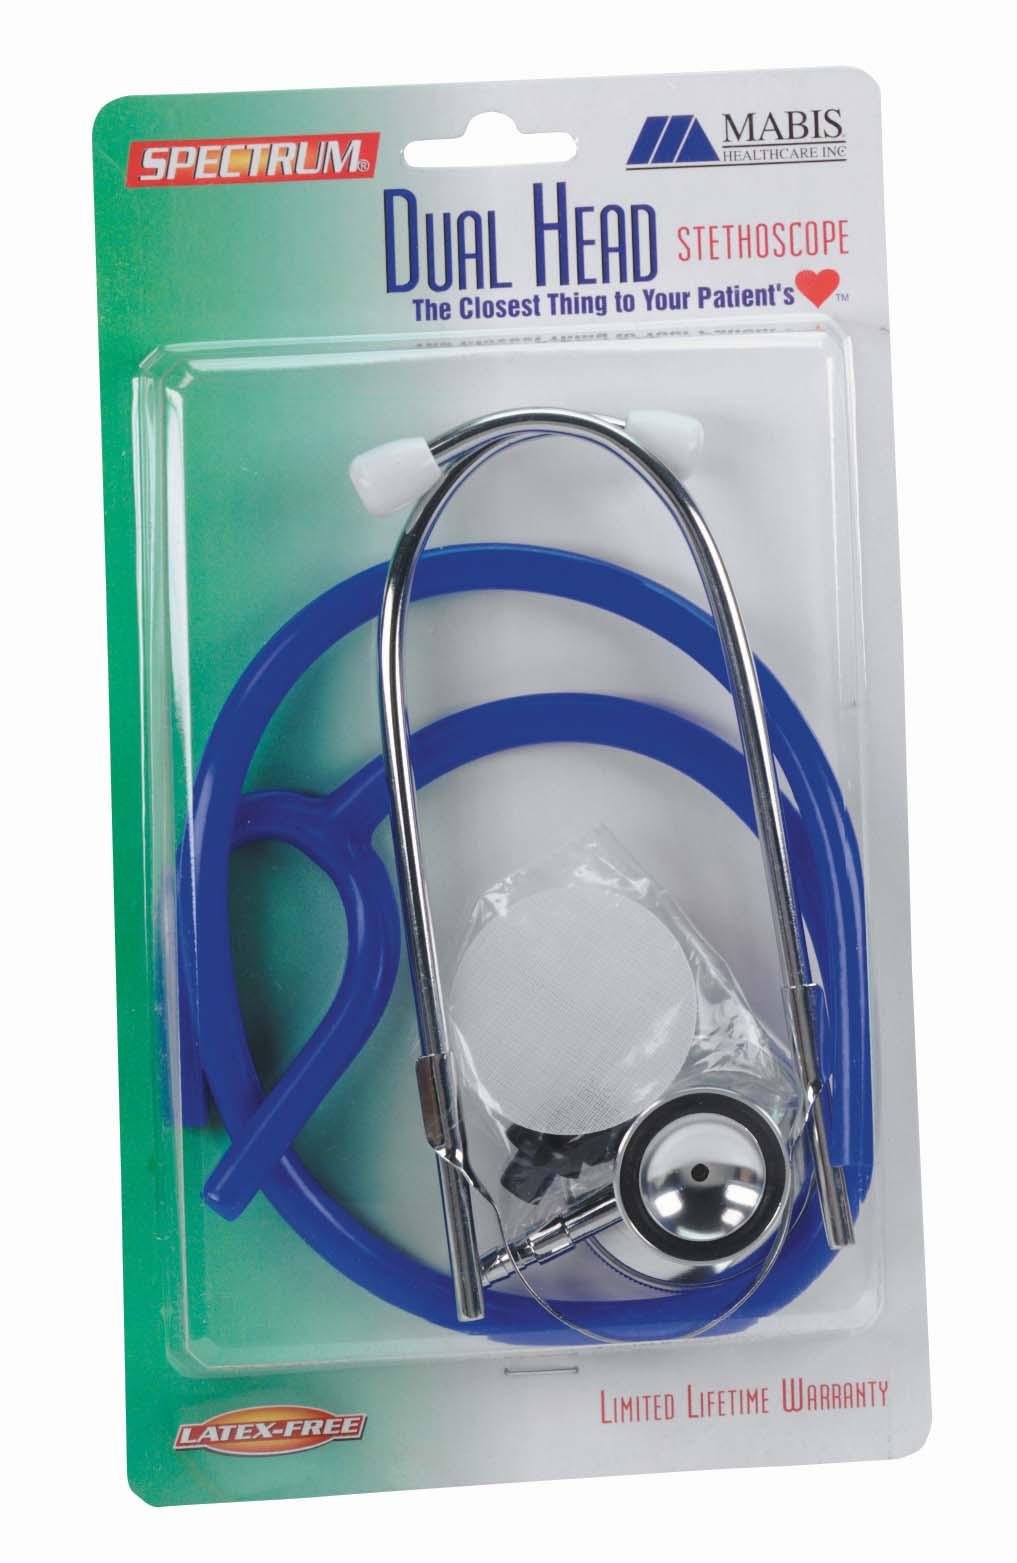 spectrum-dual-head-stethoscope-adult-slider-pack-teal-10-429-160-lr.jpg